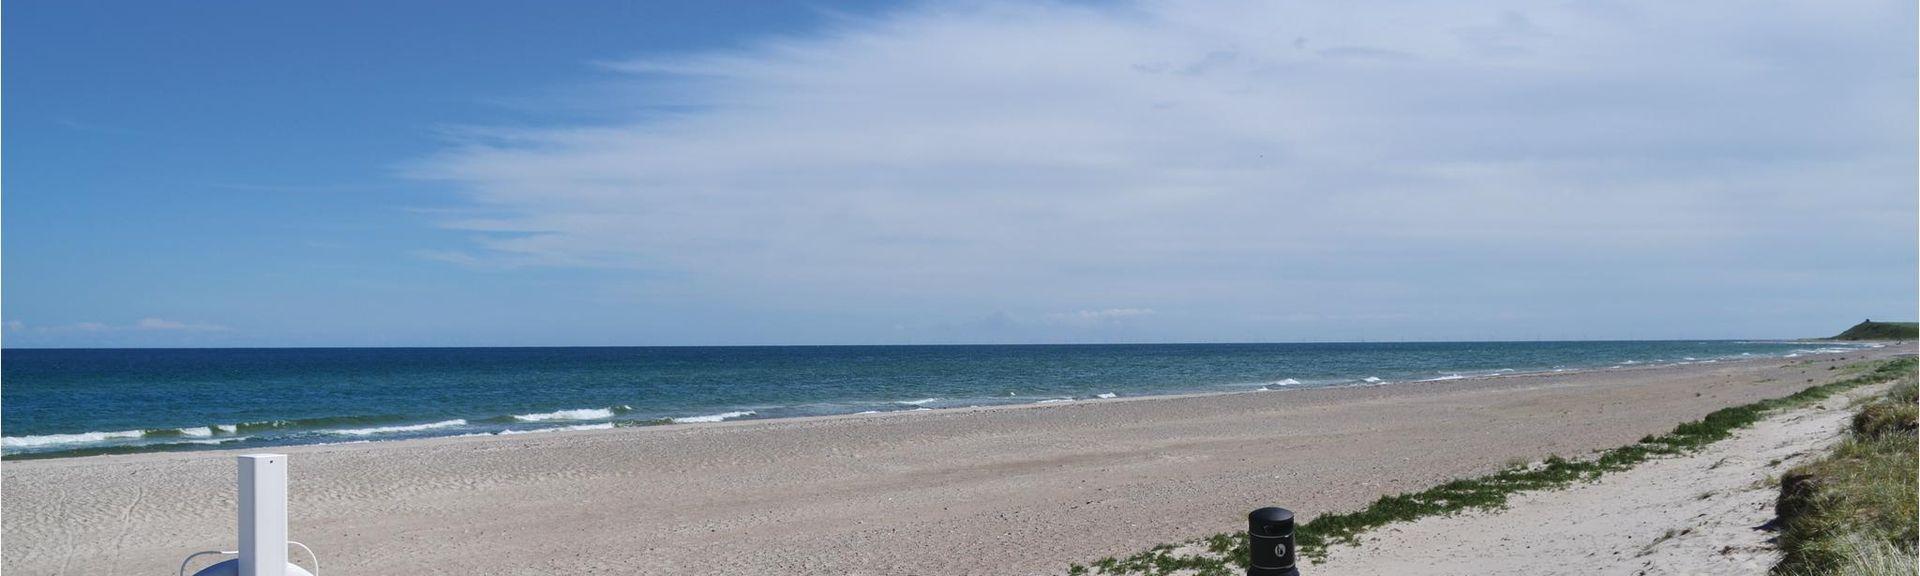 Nordstranden Beach, Grenaa, Midtjylland, Denmark